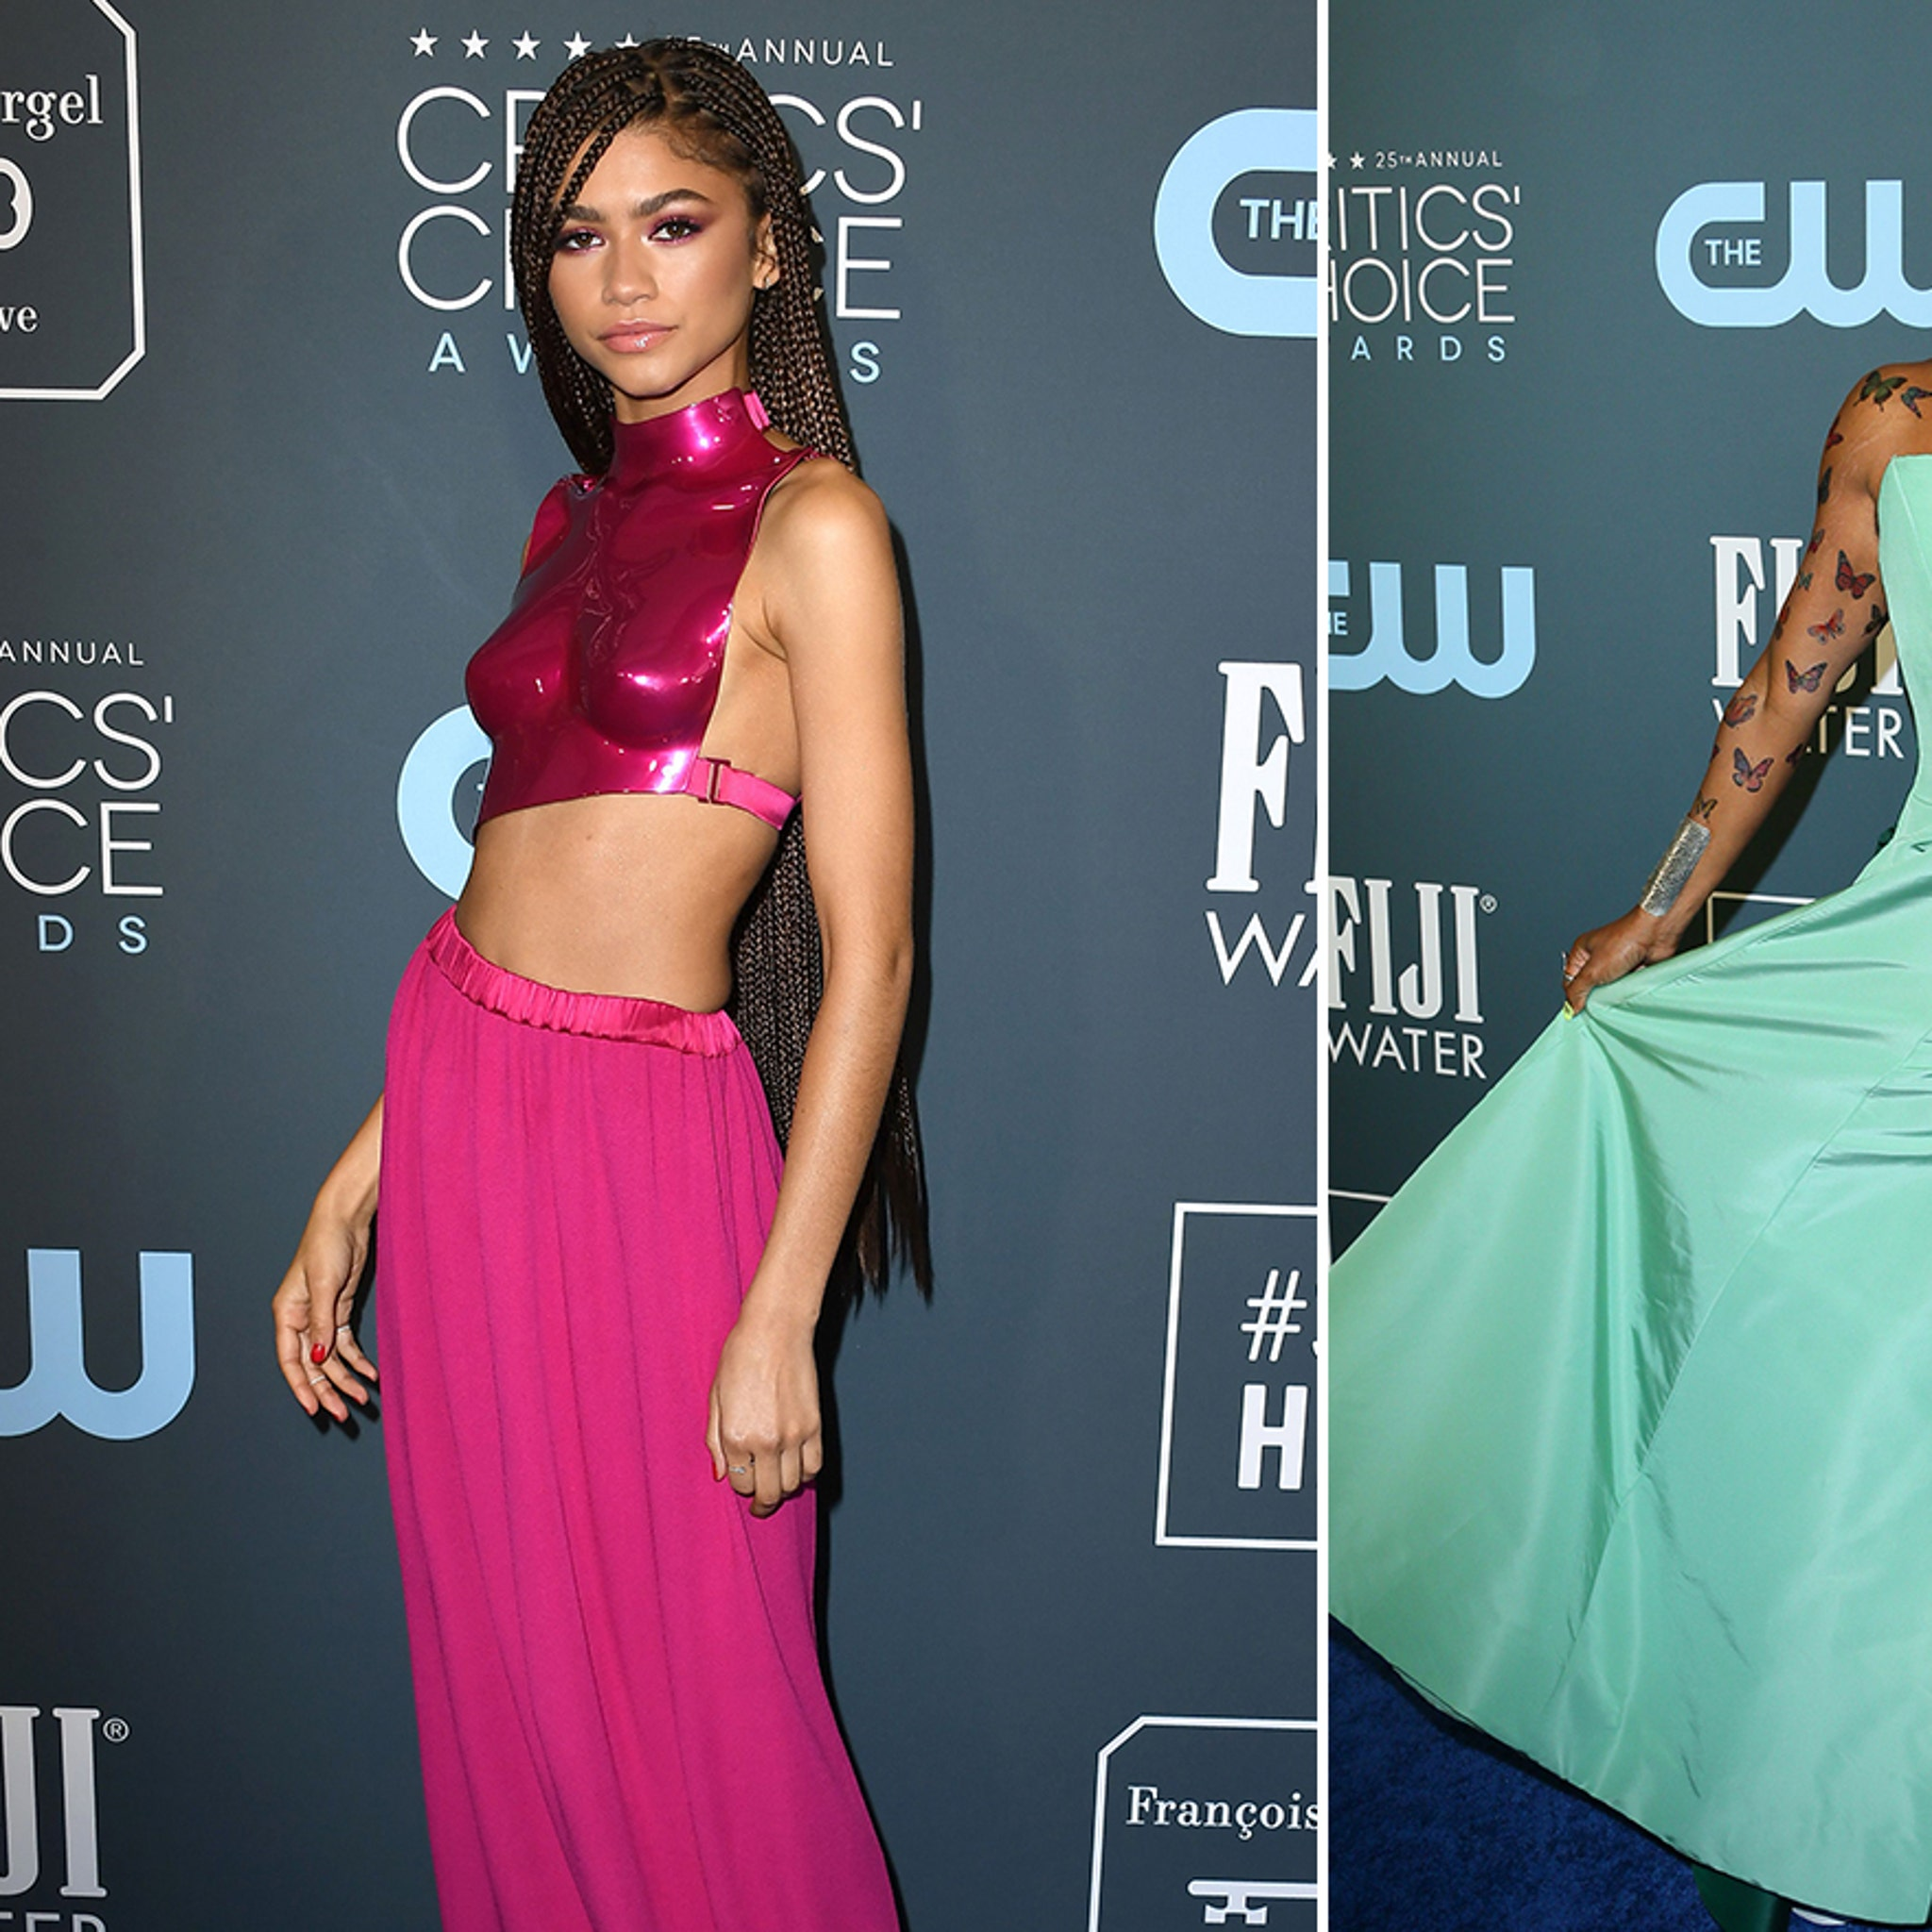 Celebs Came Dressed to Impress for the Critics' Choice Awards